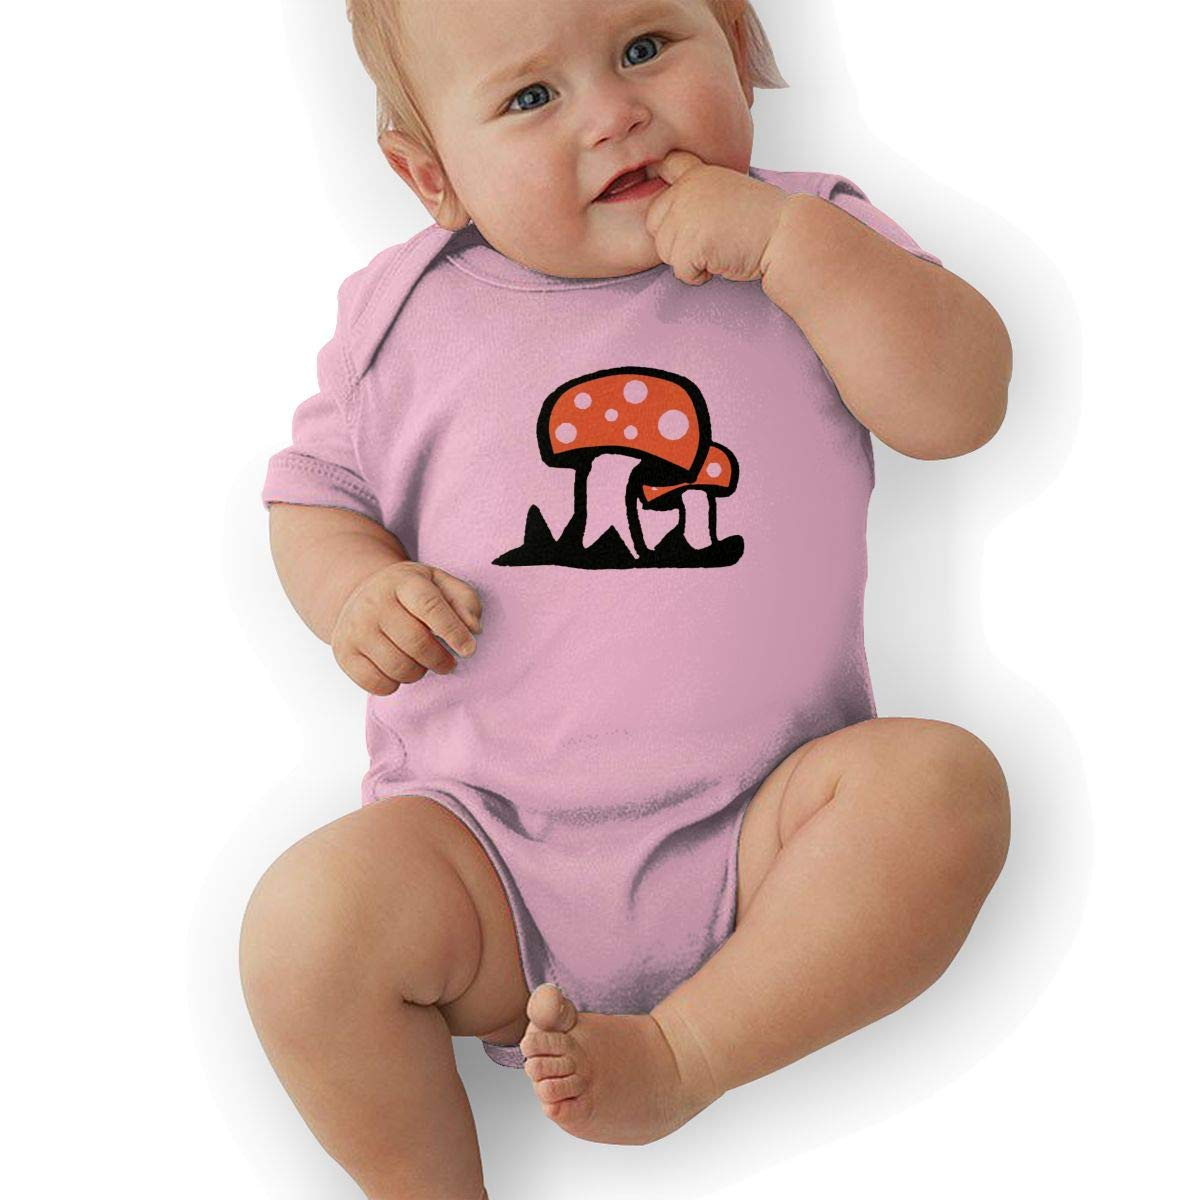 NNDSSS Fly Agaric Mushroom Cute Infant Bodysuit Romper Jumpsuit Clothes Newborn Baby Onesies